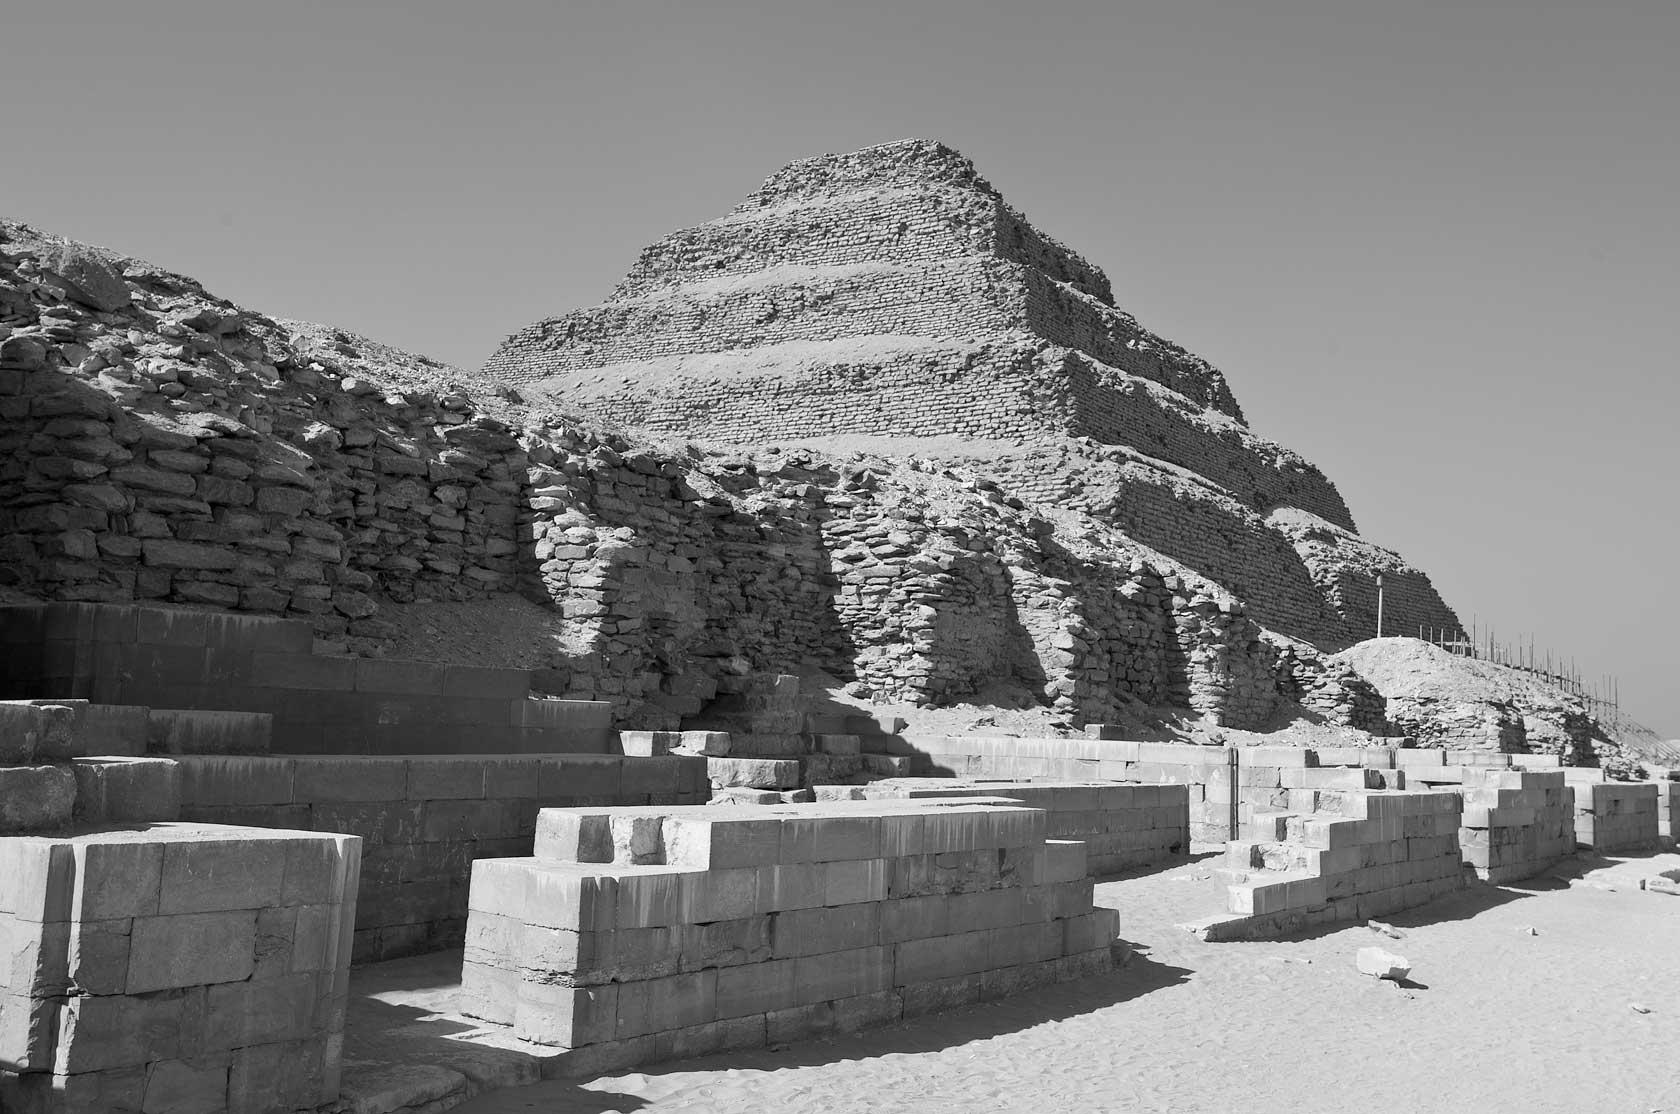 090100_DSC1778-step-pyramid.jpg